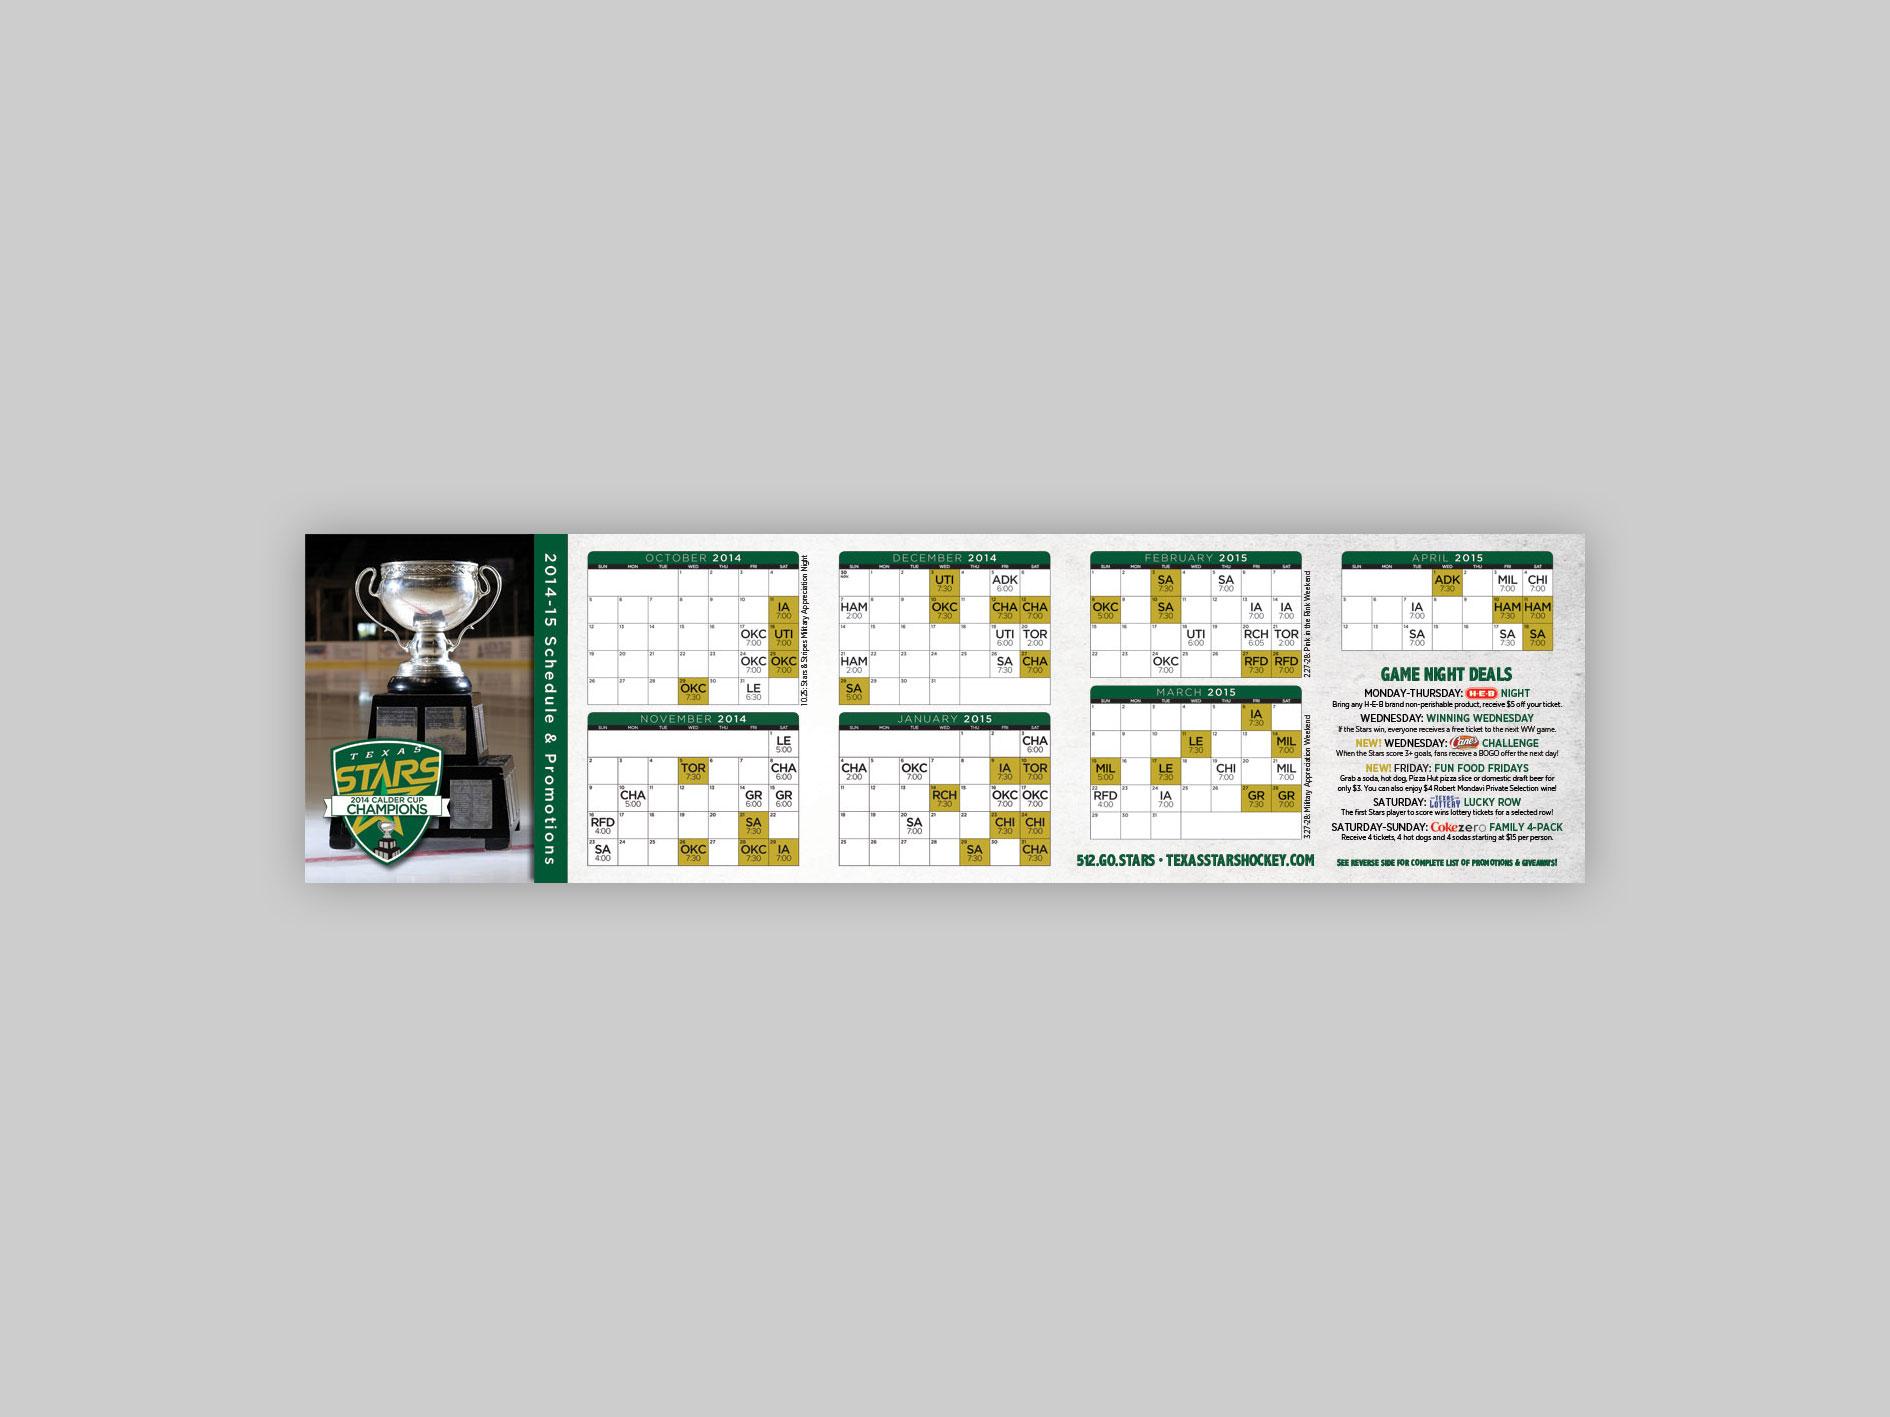 Pocket schedule, detailing ticket information, full season schedule, and promotional calendar.